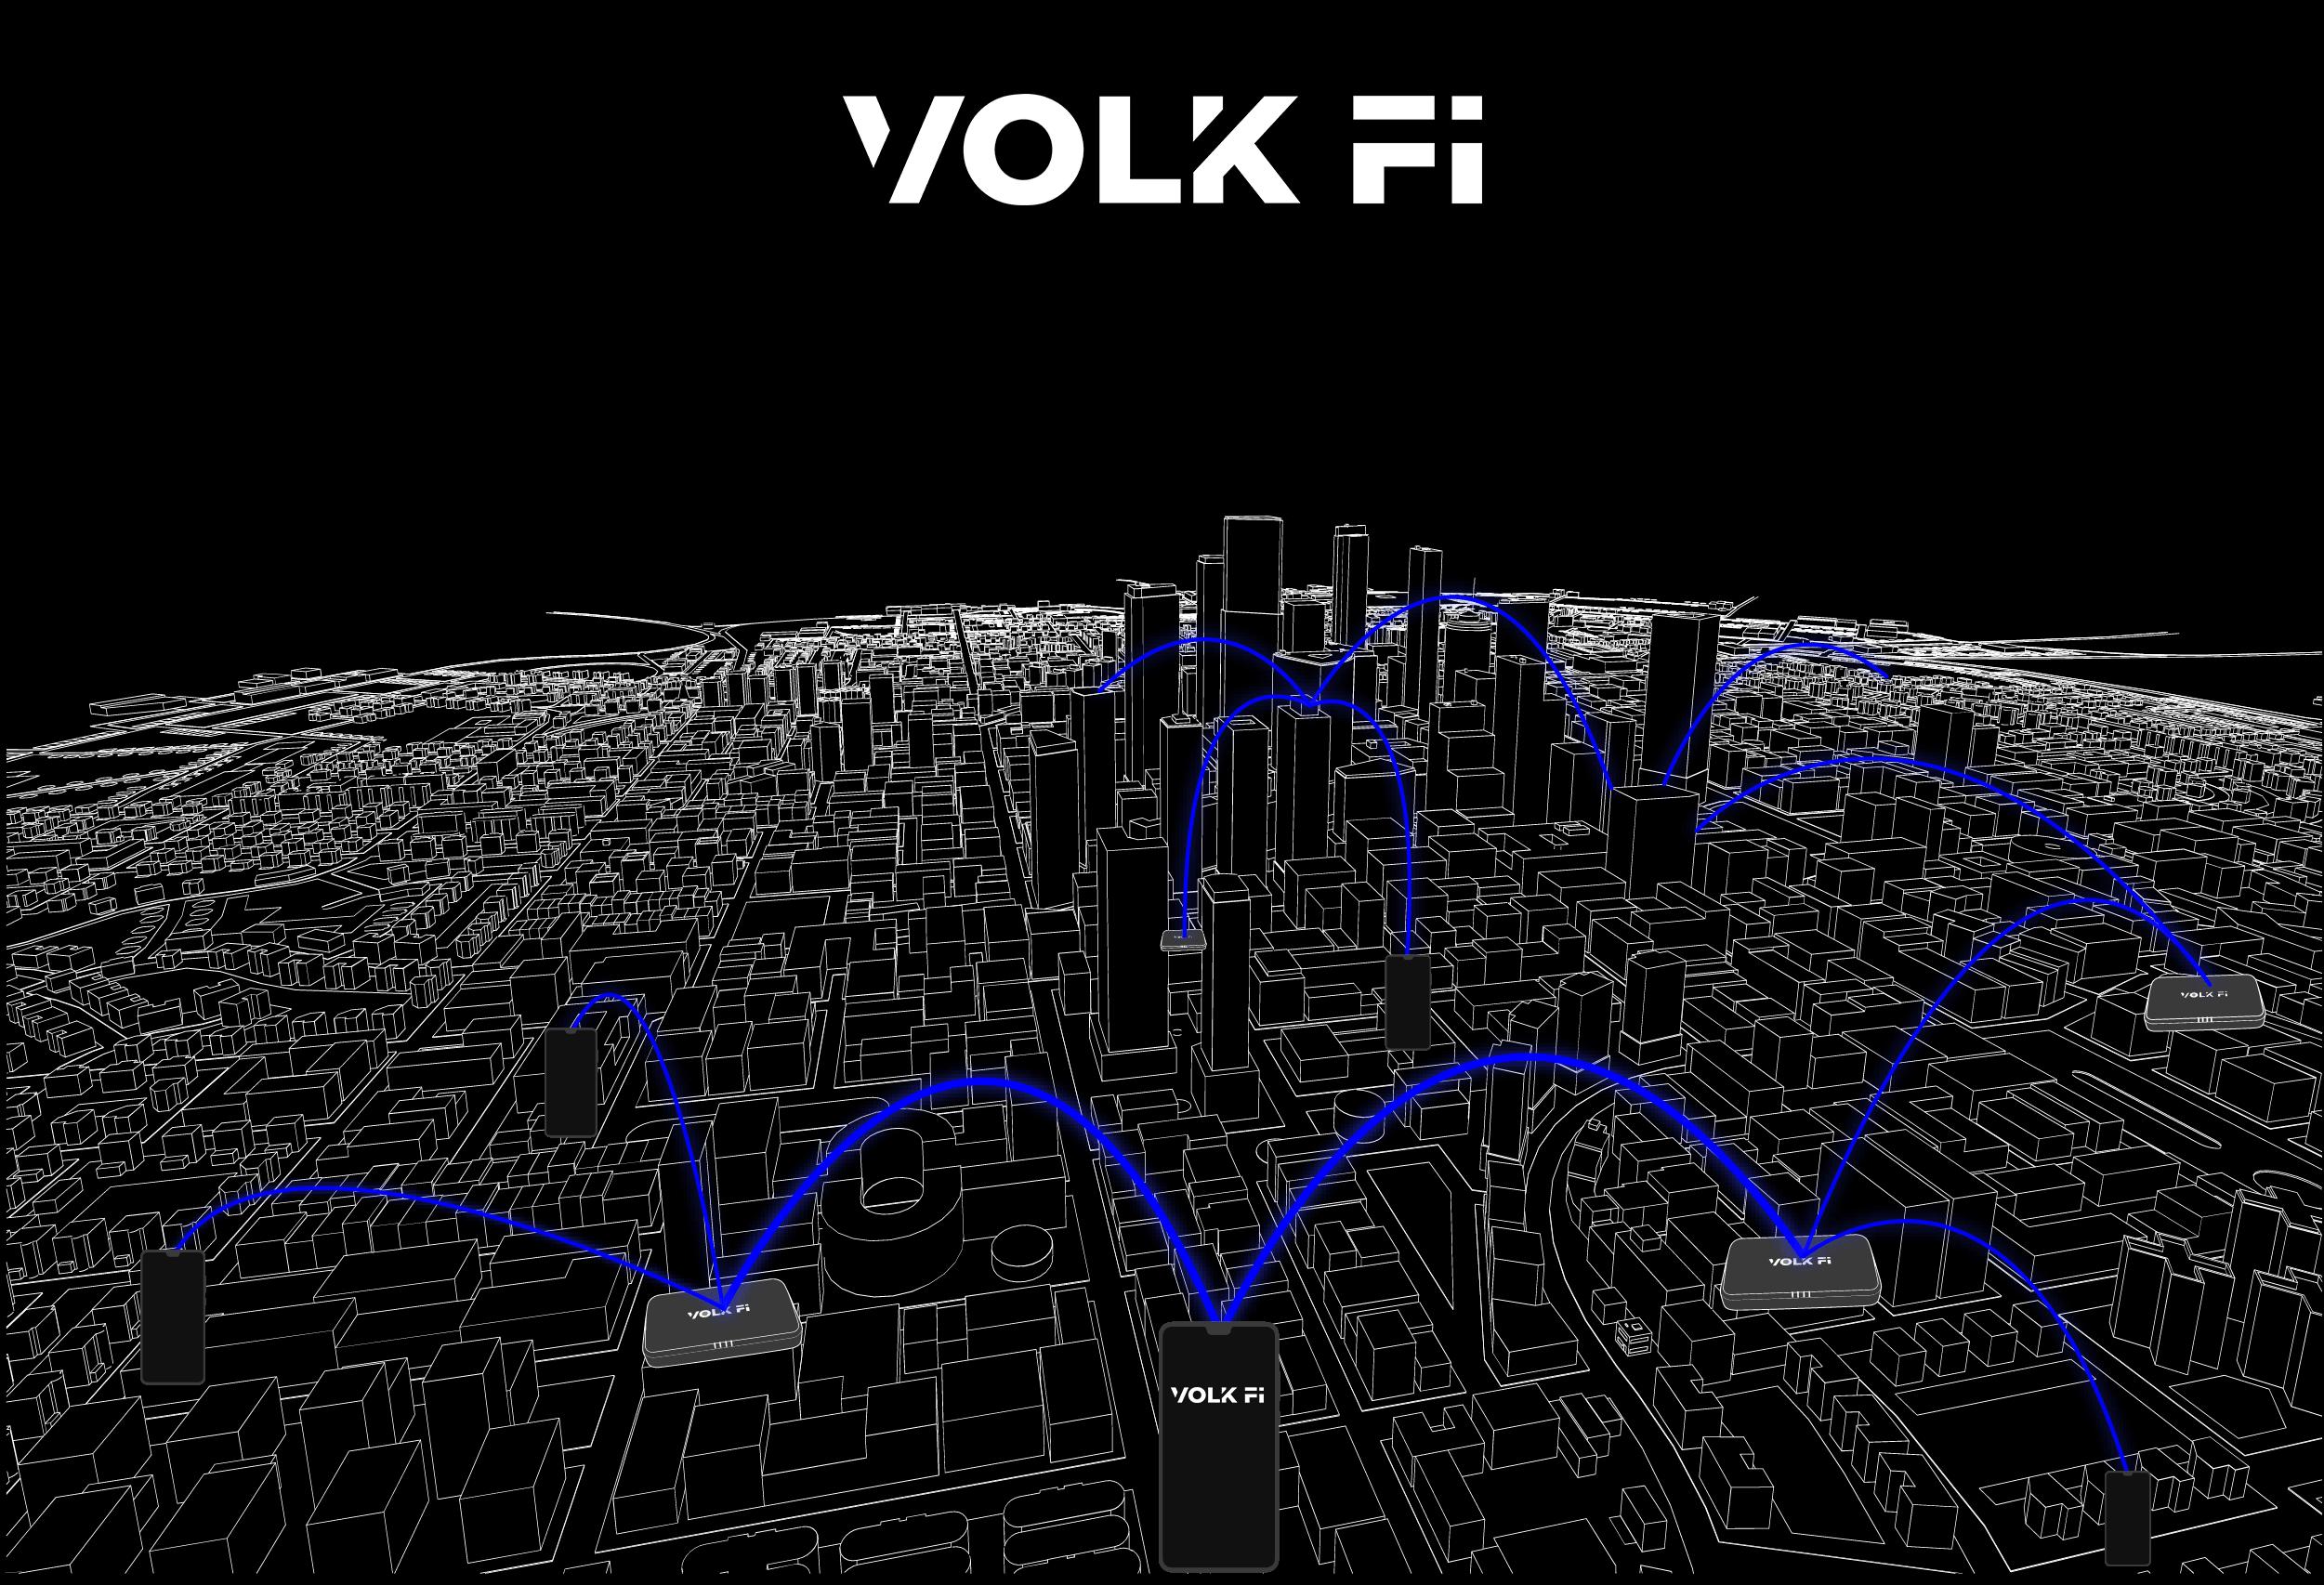 Volk One